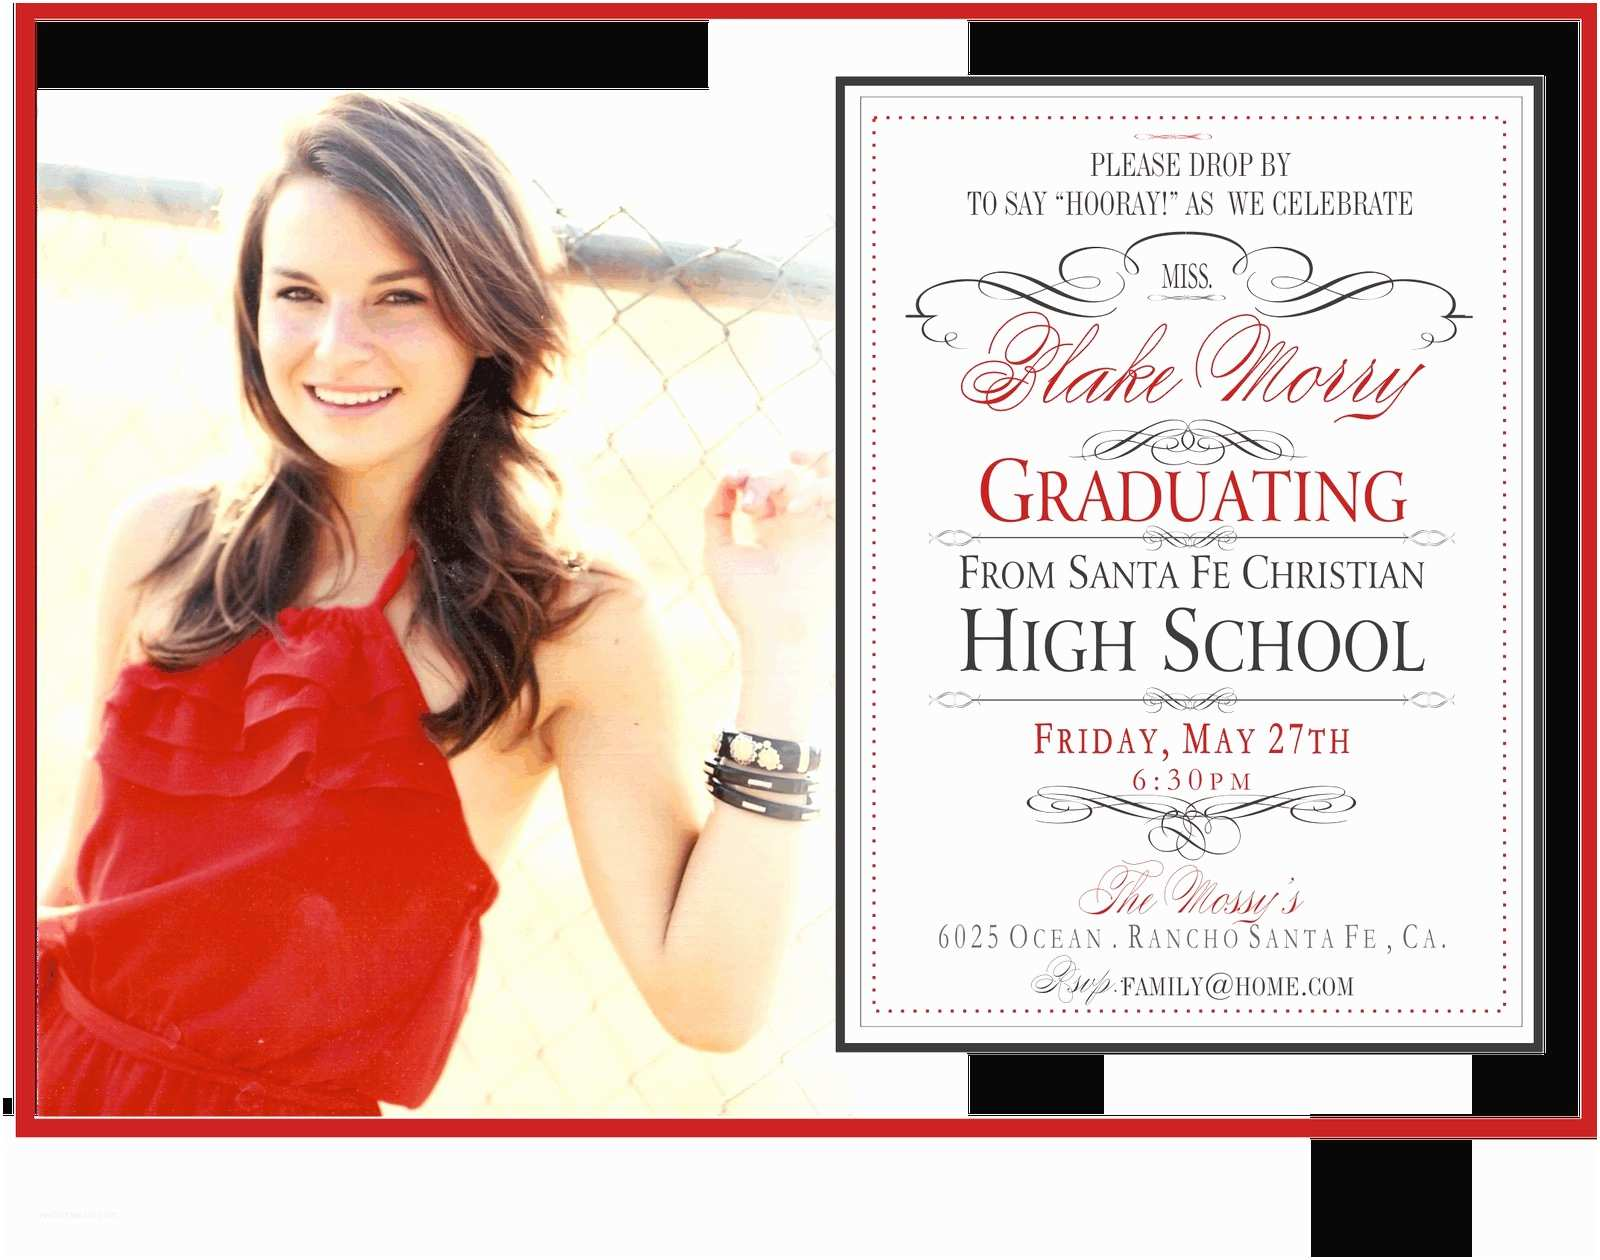 Graduation Invitation Templates High School Graduation Invitation Template Various